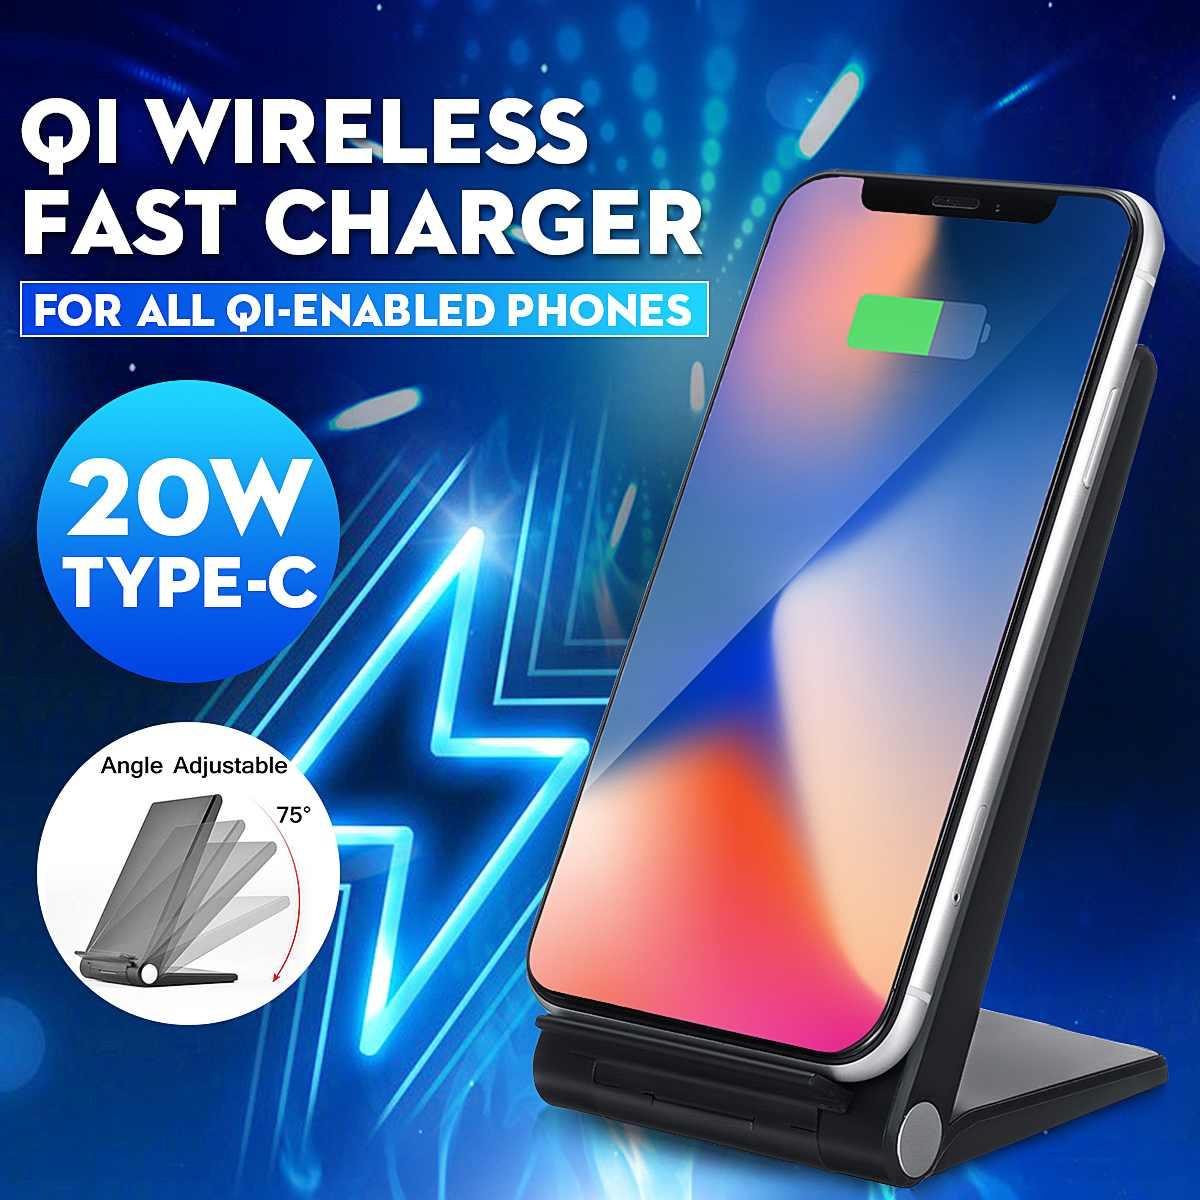 Cargador inalámbrico 20W Qi para iPhone 11 Pro XR XS Max Xiaomi mi 10 soporte de carga inalámbrico rápido para Samsung S20 S10